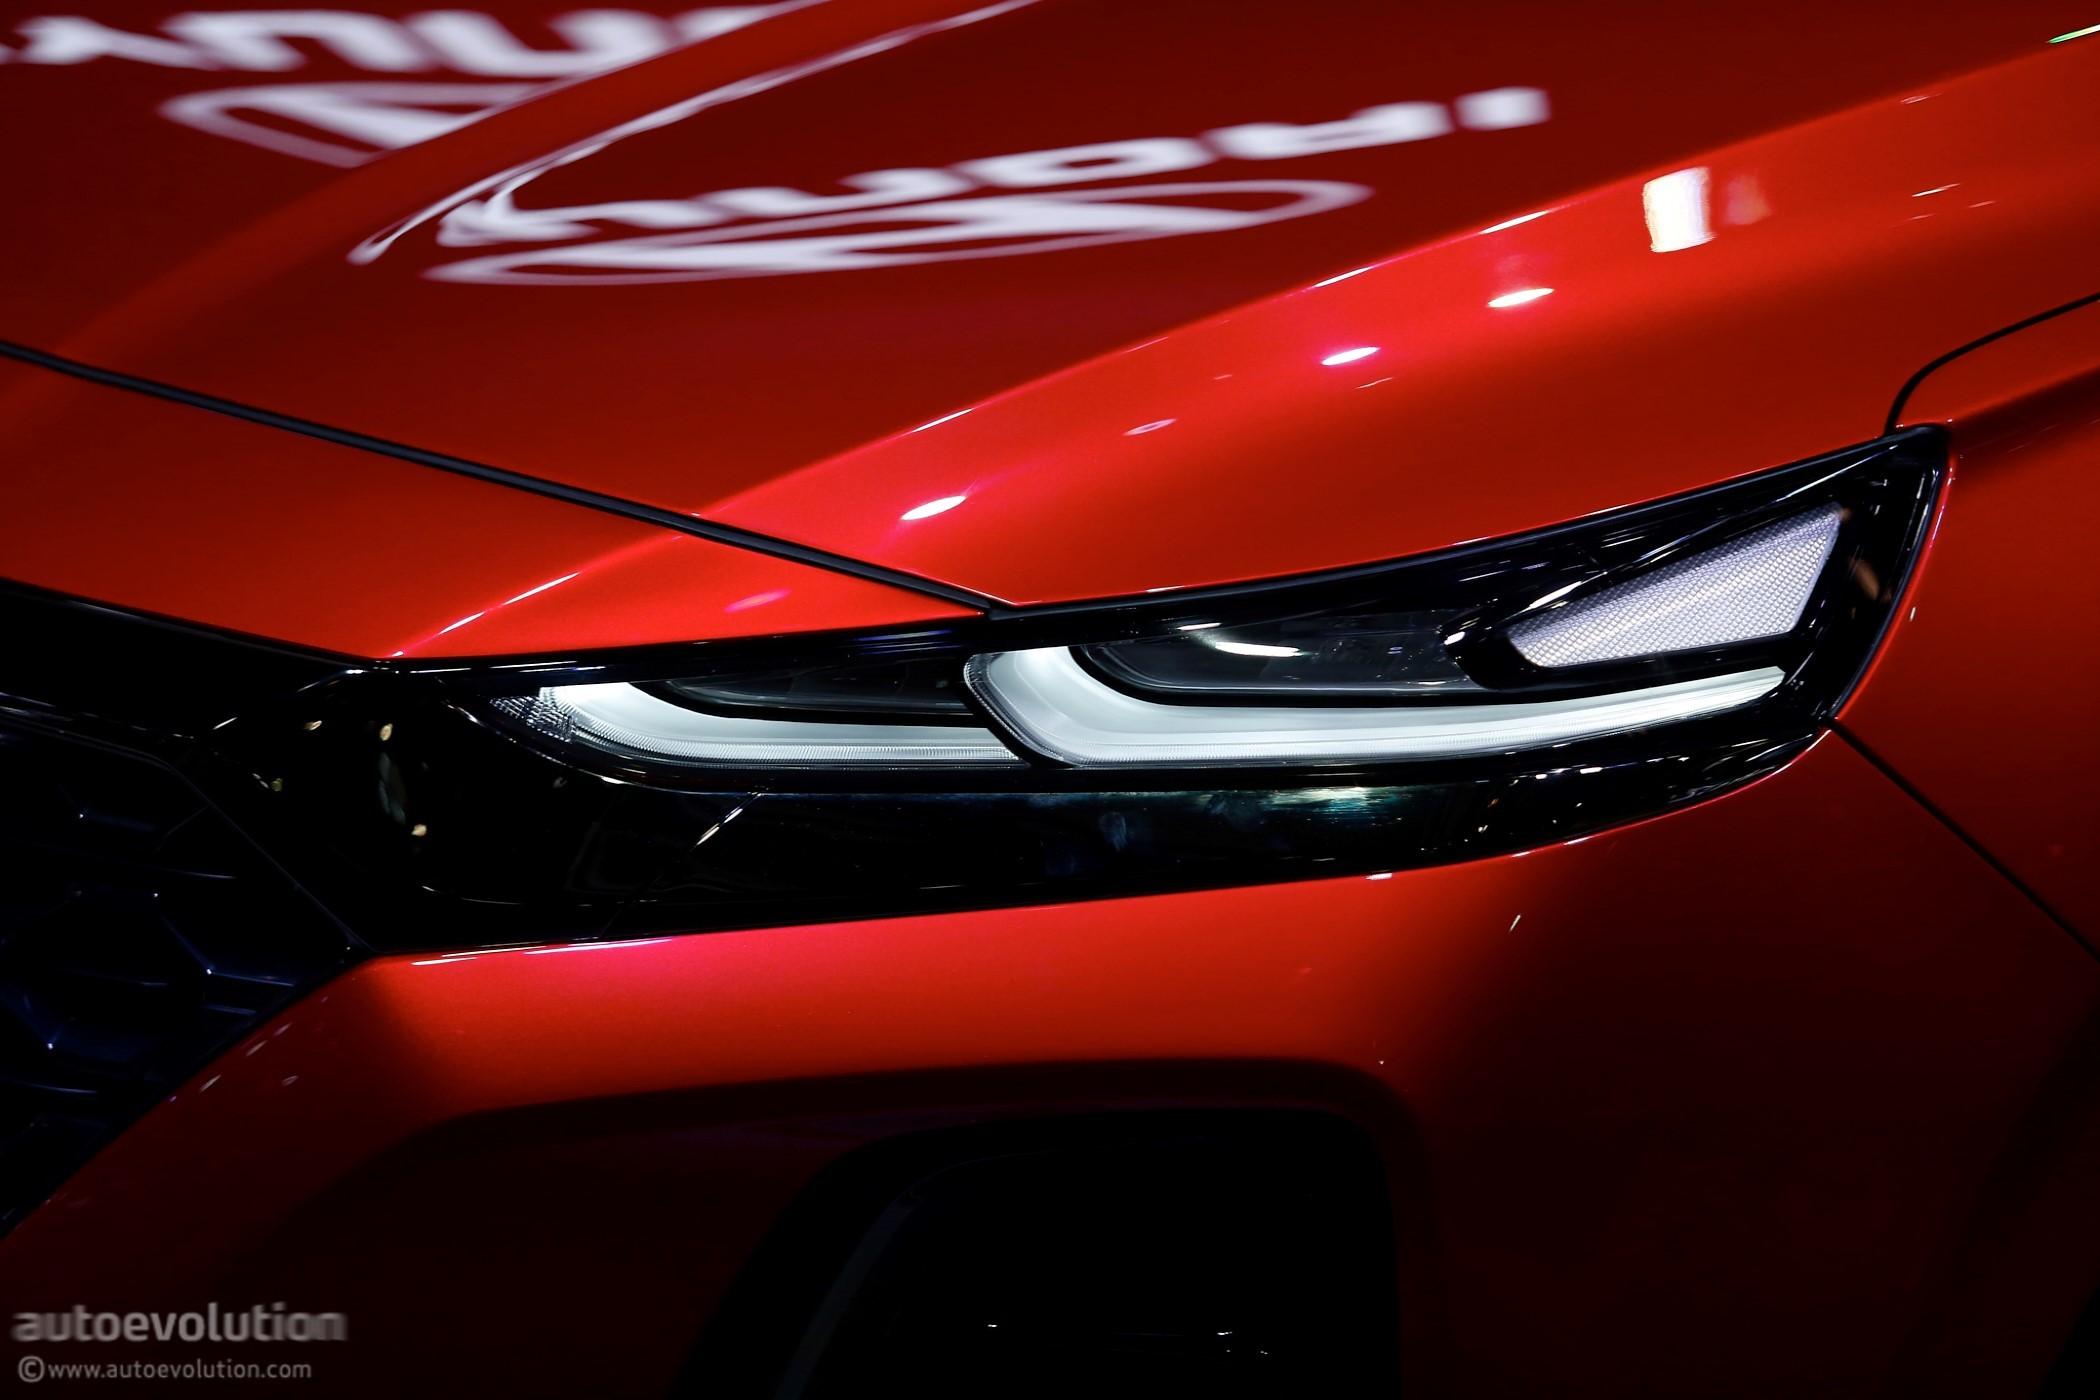 Hyundai Bringing New Santa Fe, Tucson Facelift and Kona EV